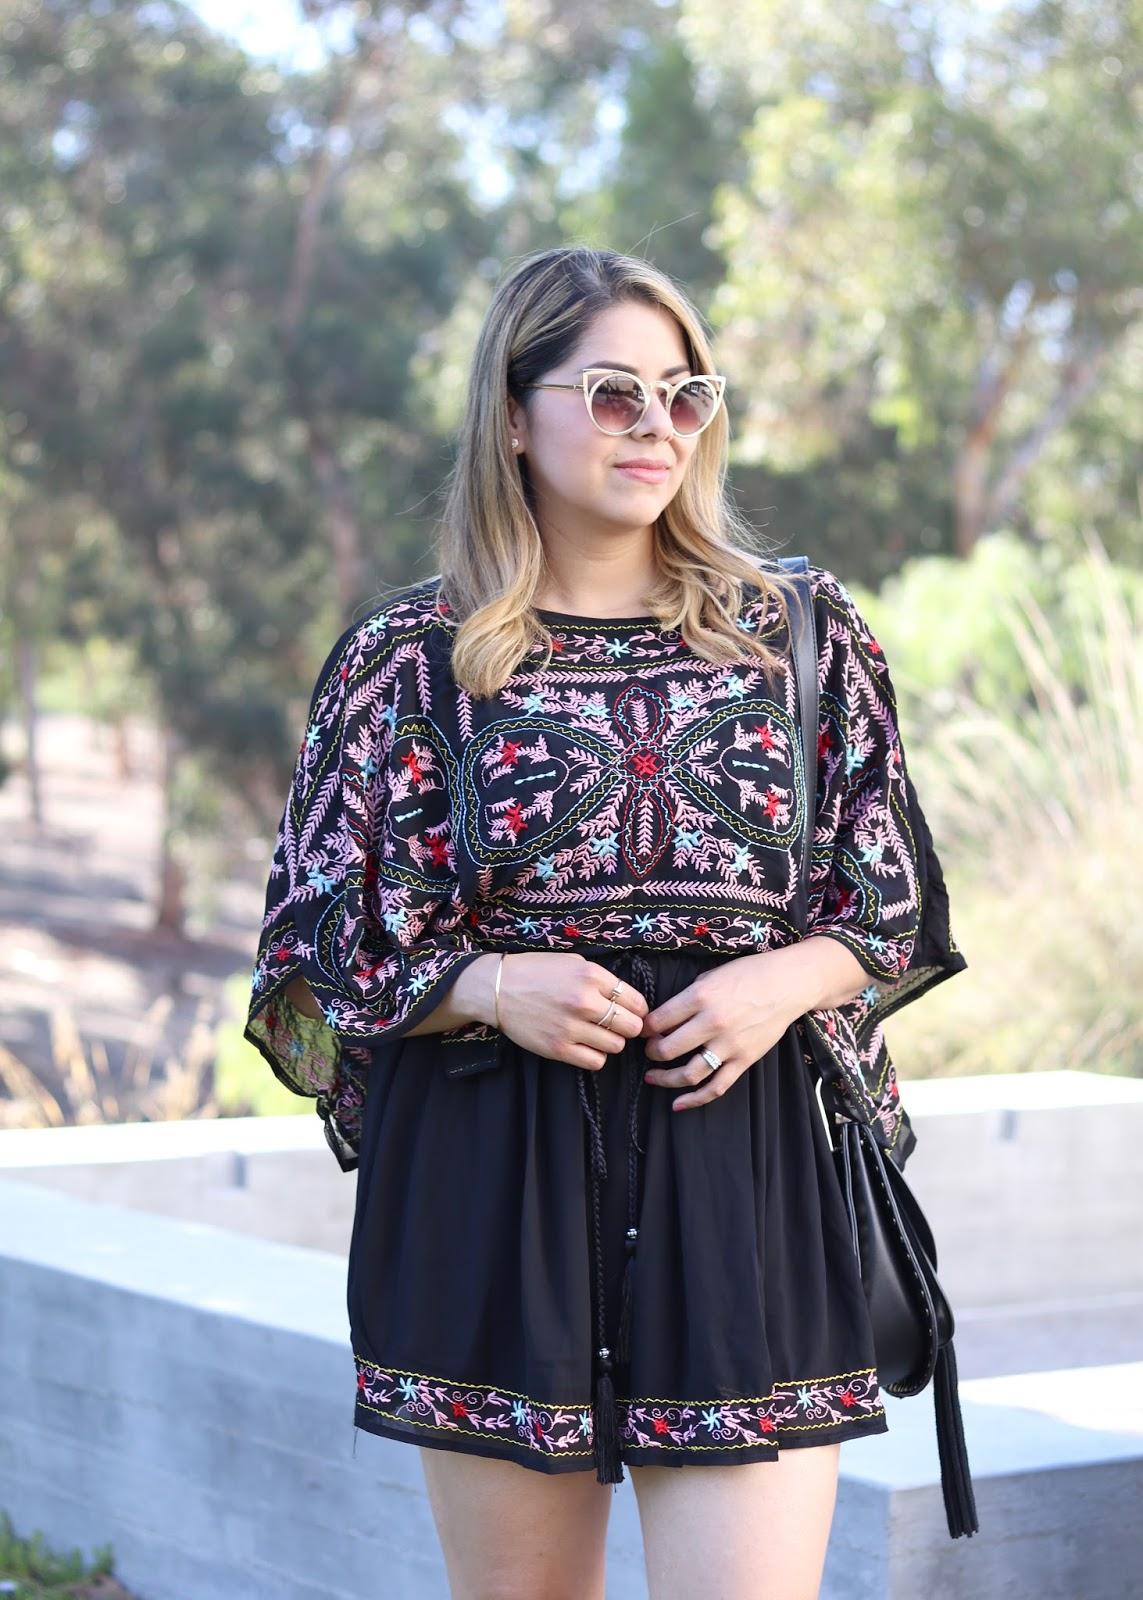 fun sunglasses, chicwish dress, what to wear this summer, fun little black dress